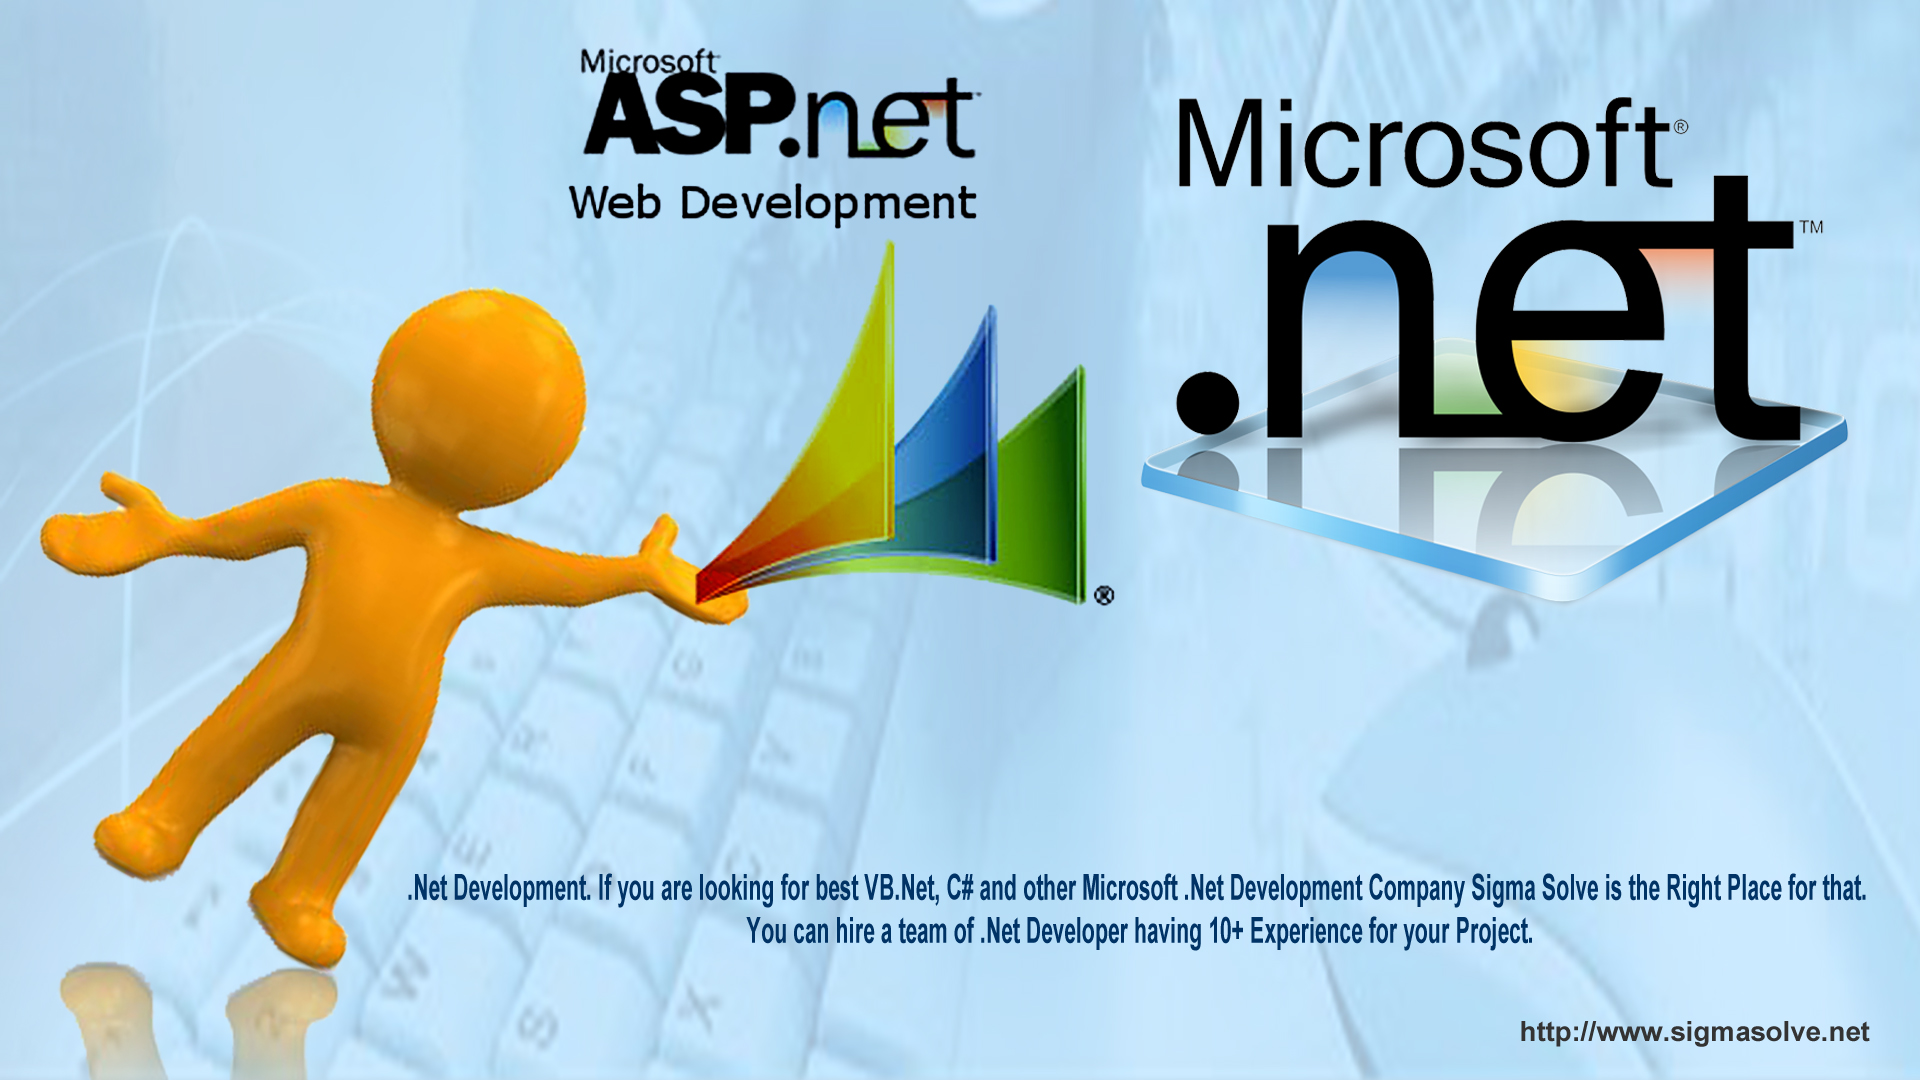 Microsoft-ASP.net-web-development